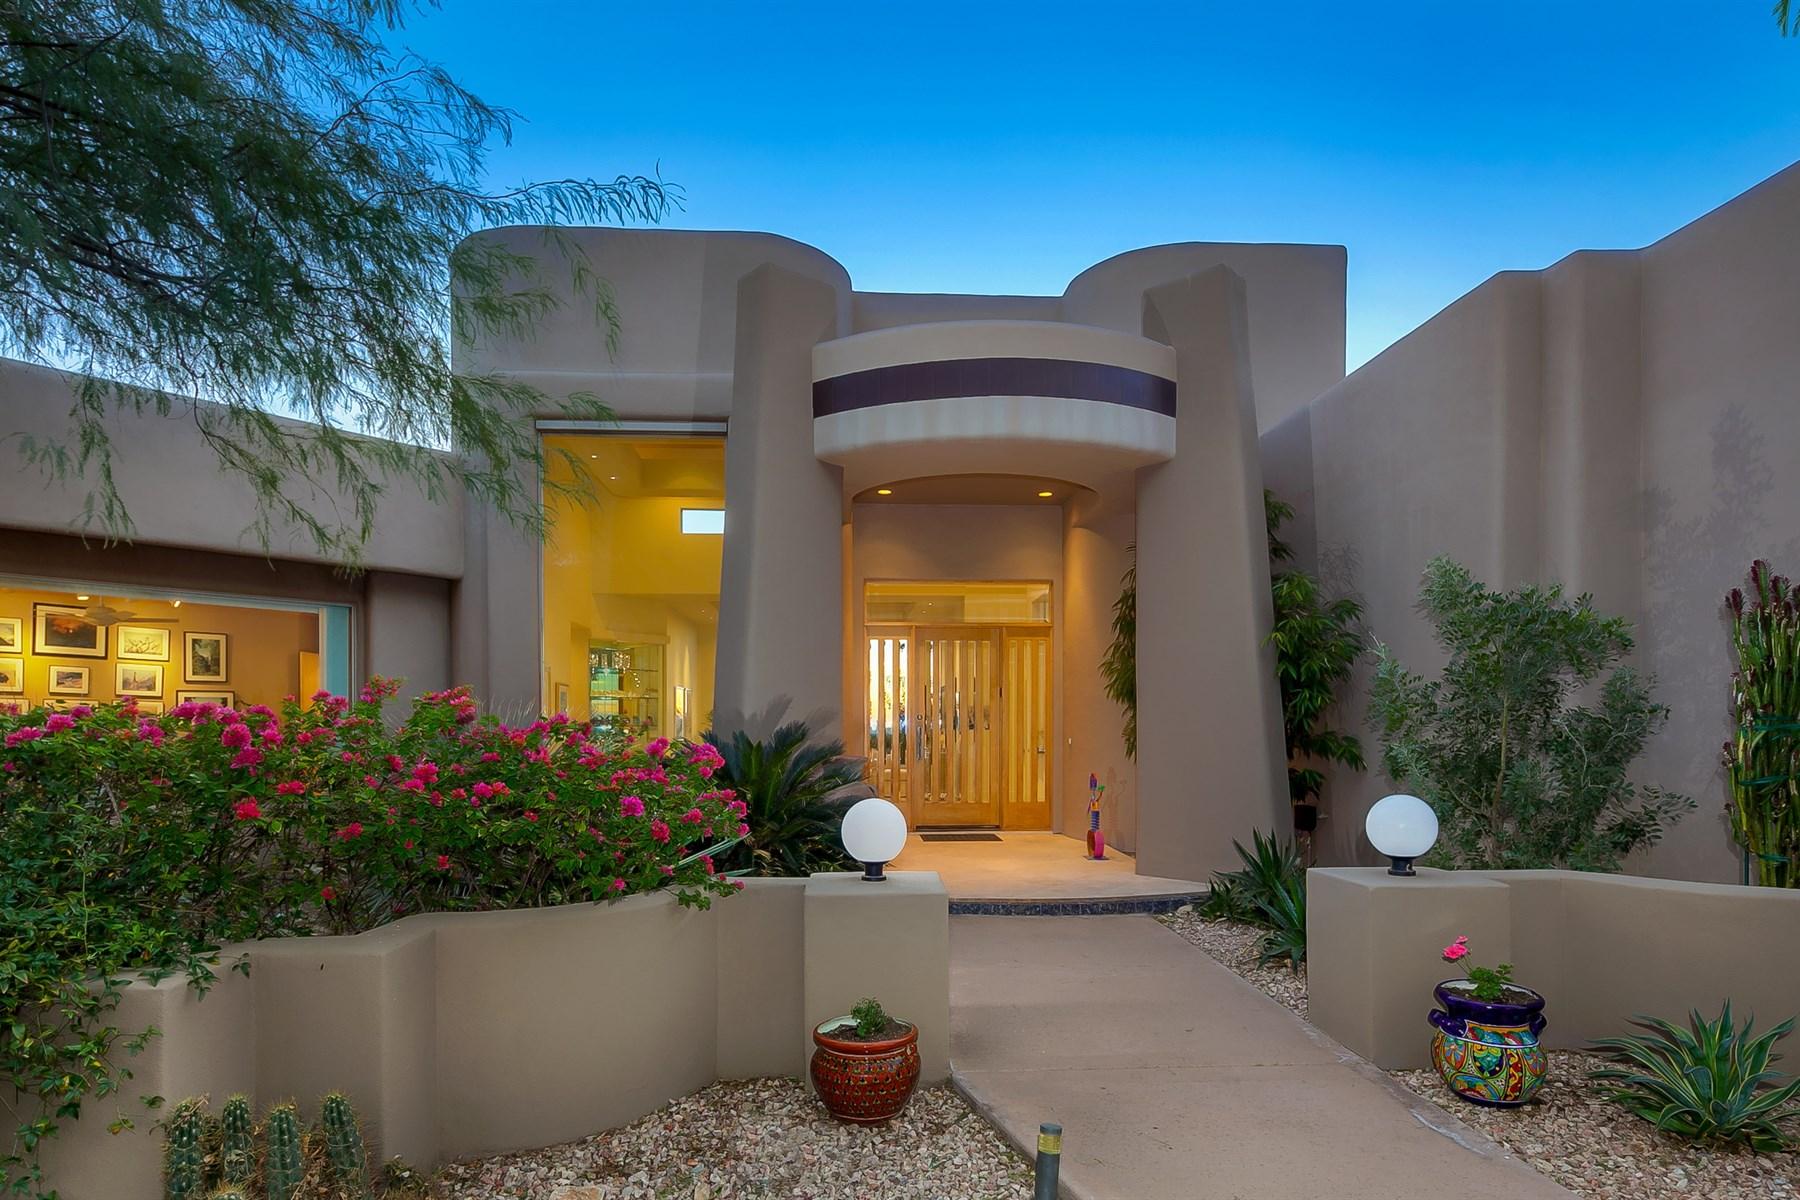 Casa Unifamiliar por un Venta en Spectacular views from this sensational custom home 11825 E Desert Trail Rd Scottsdale, Arizona 85259 Estados Unidos